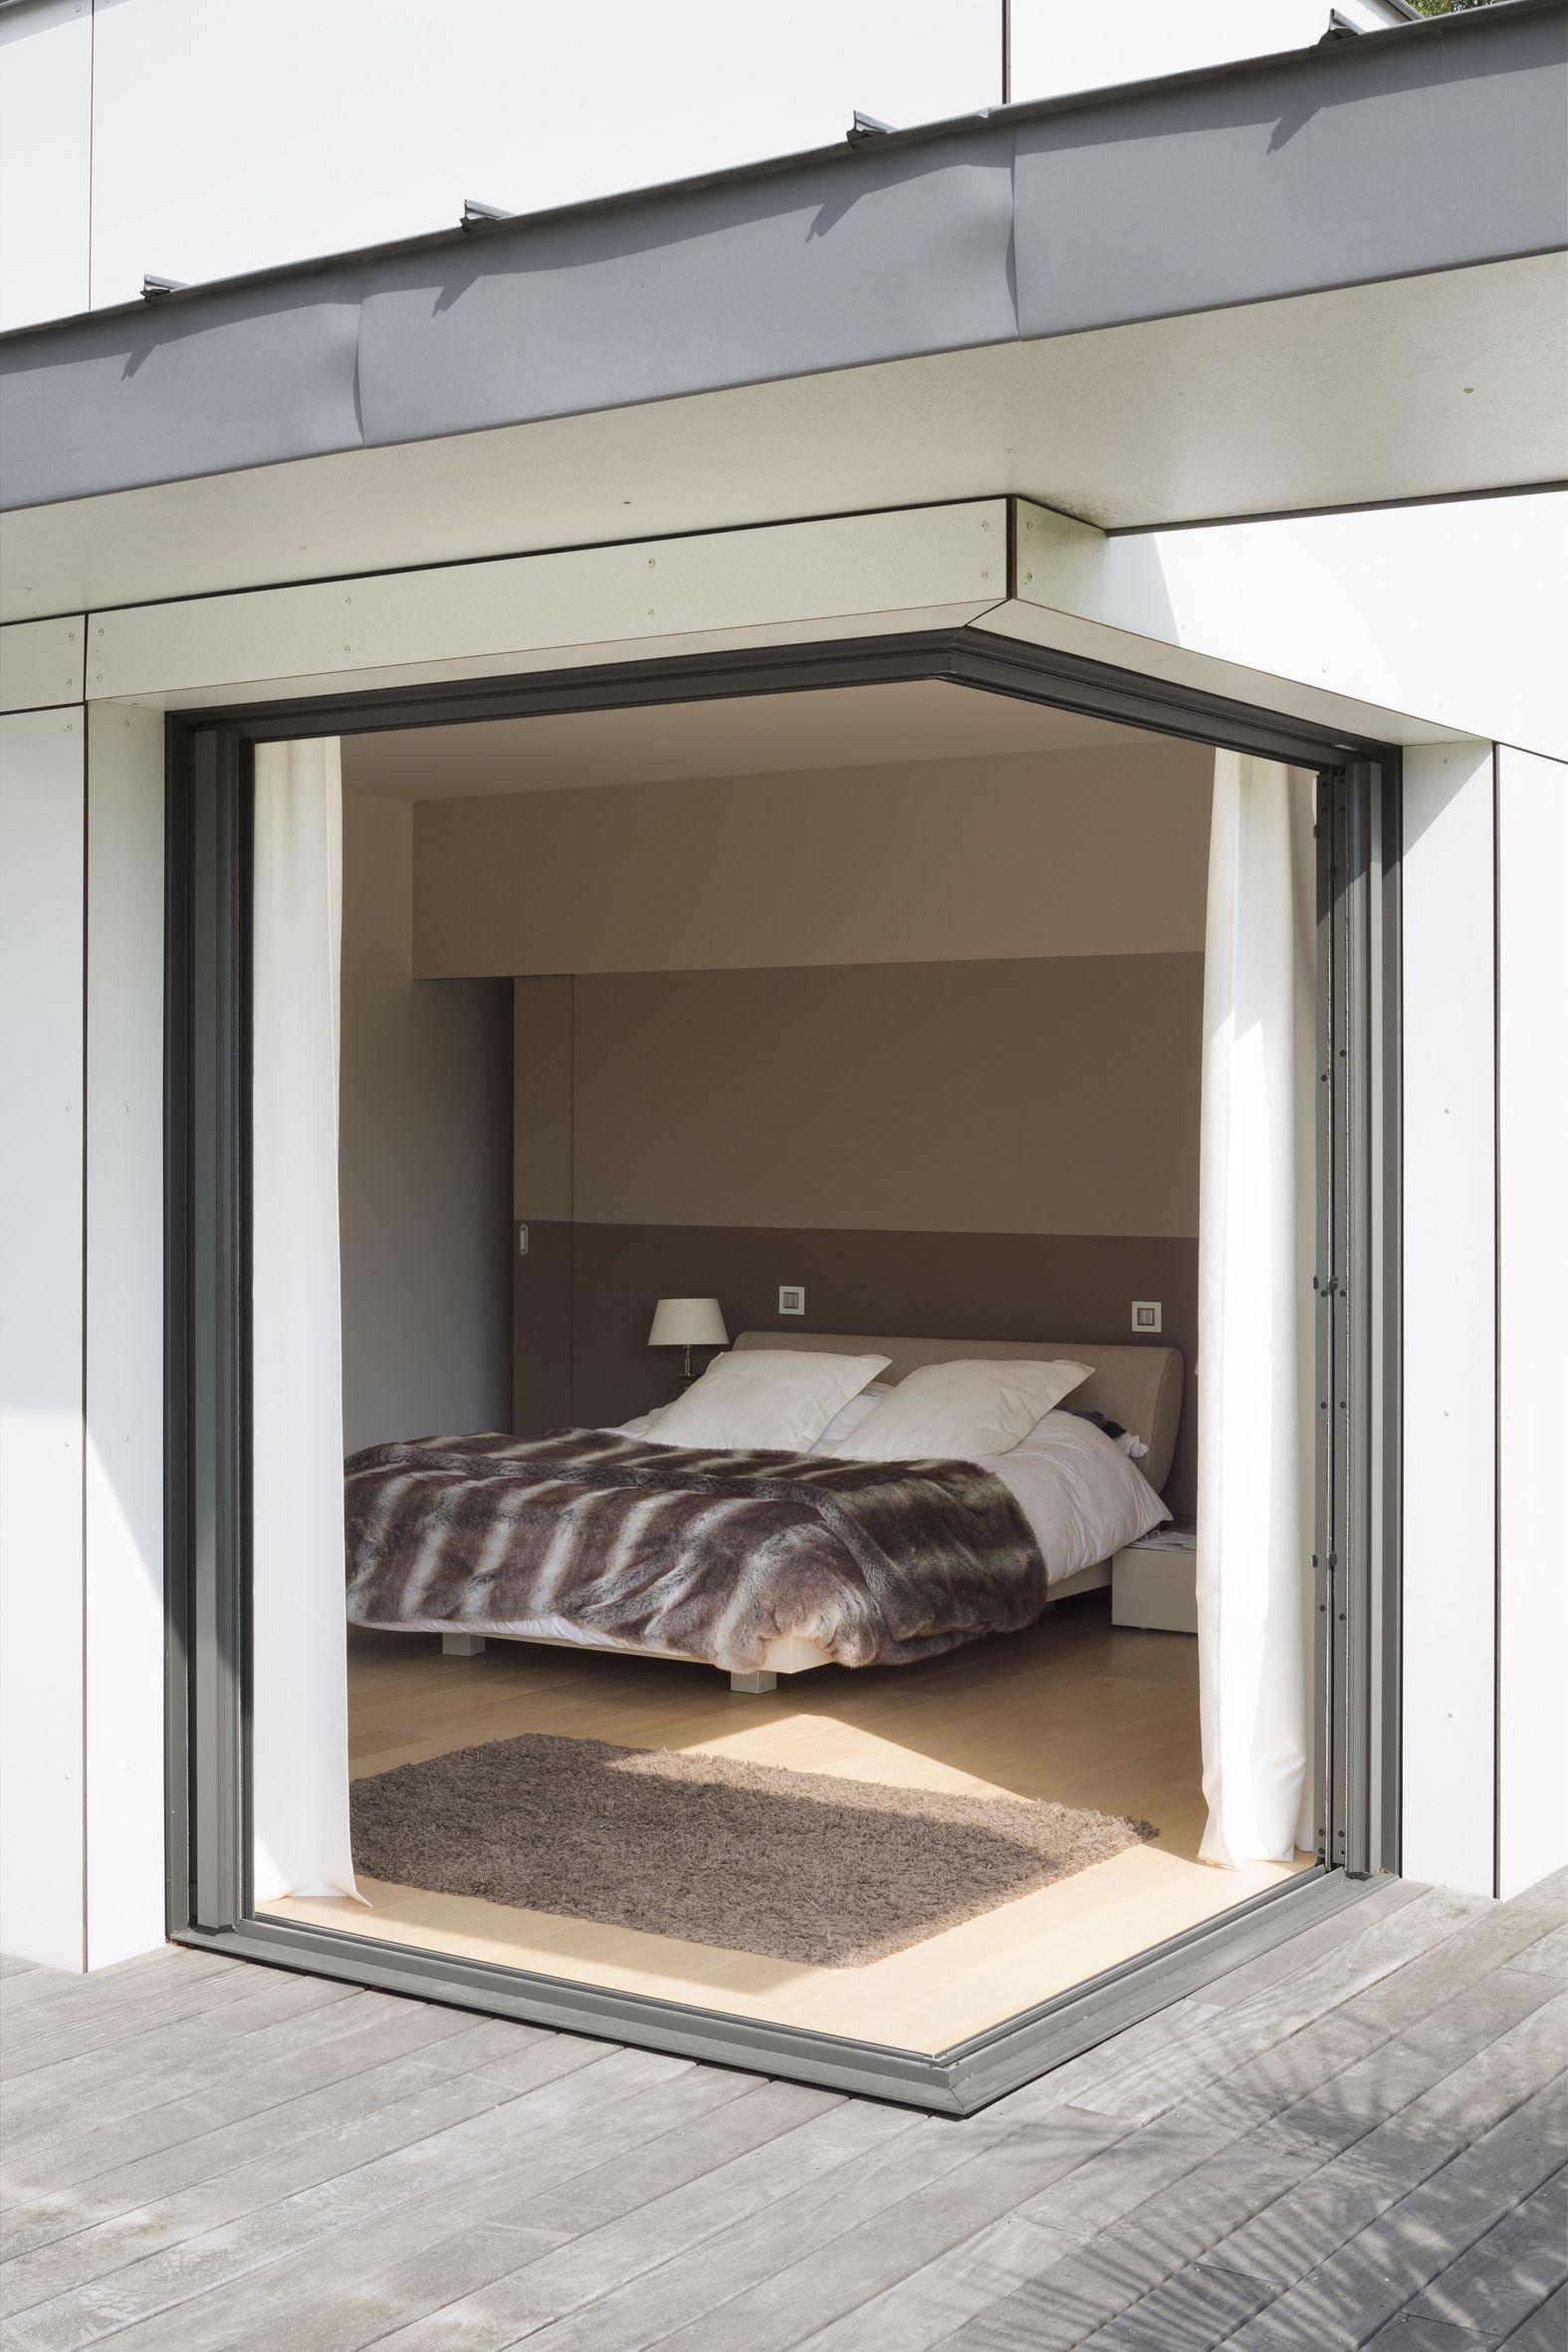 bloc coulissant galandage d 39 angle an aluminium d 39 initial photo xavier boymond fen tres. Black Bedroom Furniture Sets. Home Design Ideas